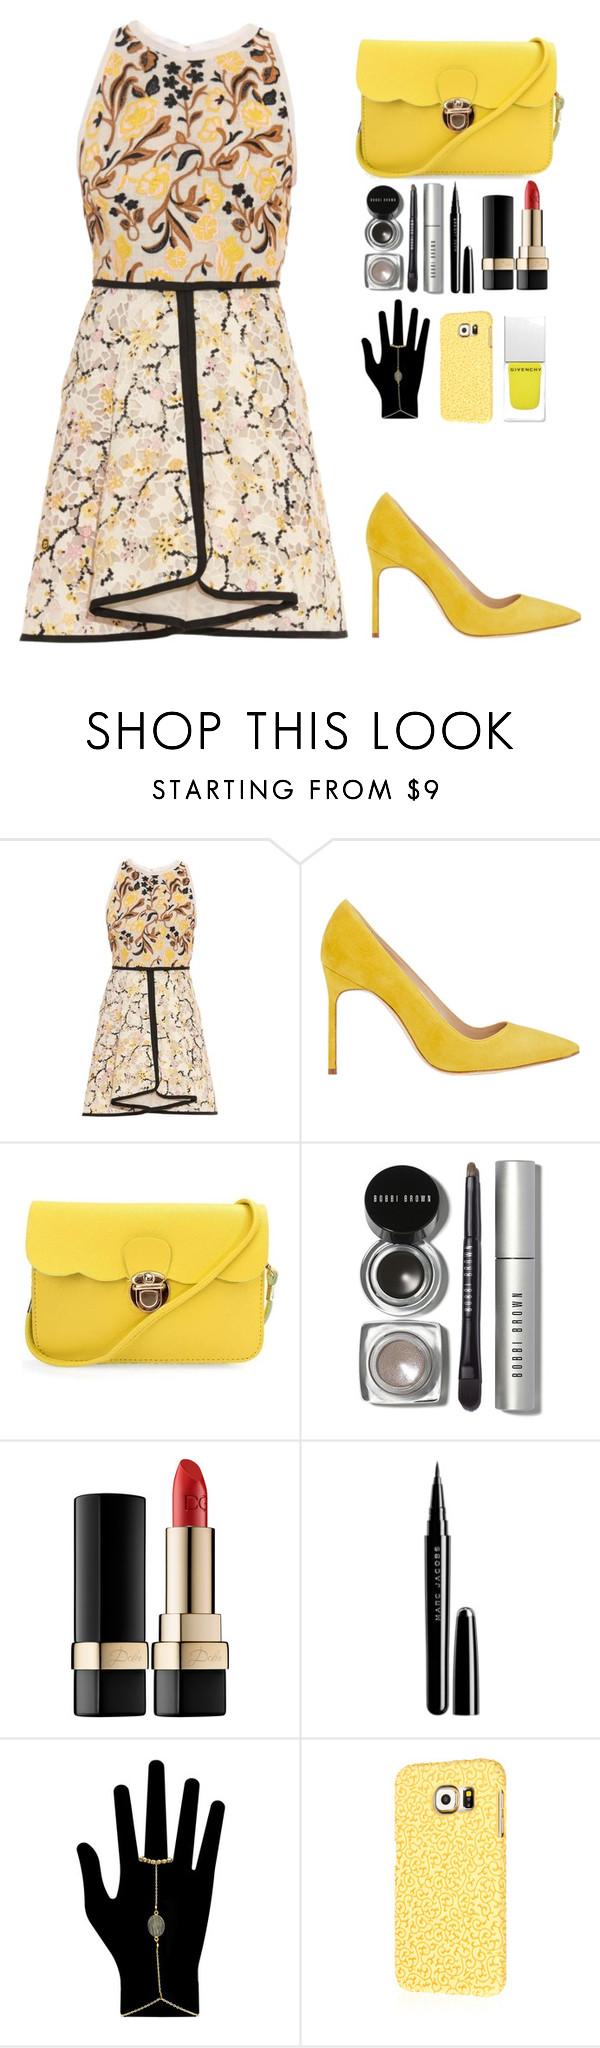 """"" by barijeziberi ❤ liked on Polyvore featuring beauty, Giambattista Valli, Manolo Blahnik, Bobbi Brown Cosmetics, Dolce&Gabbana, Marc Jacobs, Samsung and Givenchy"